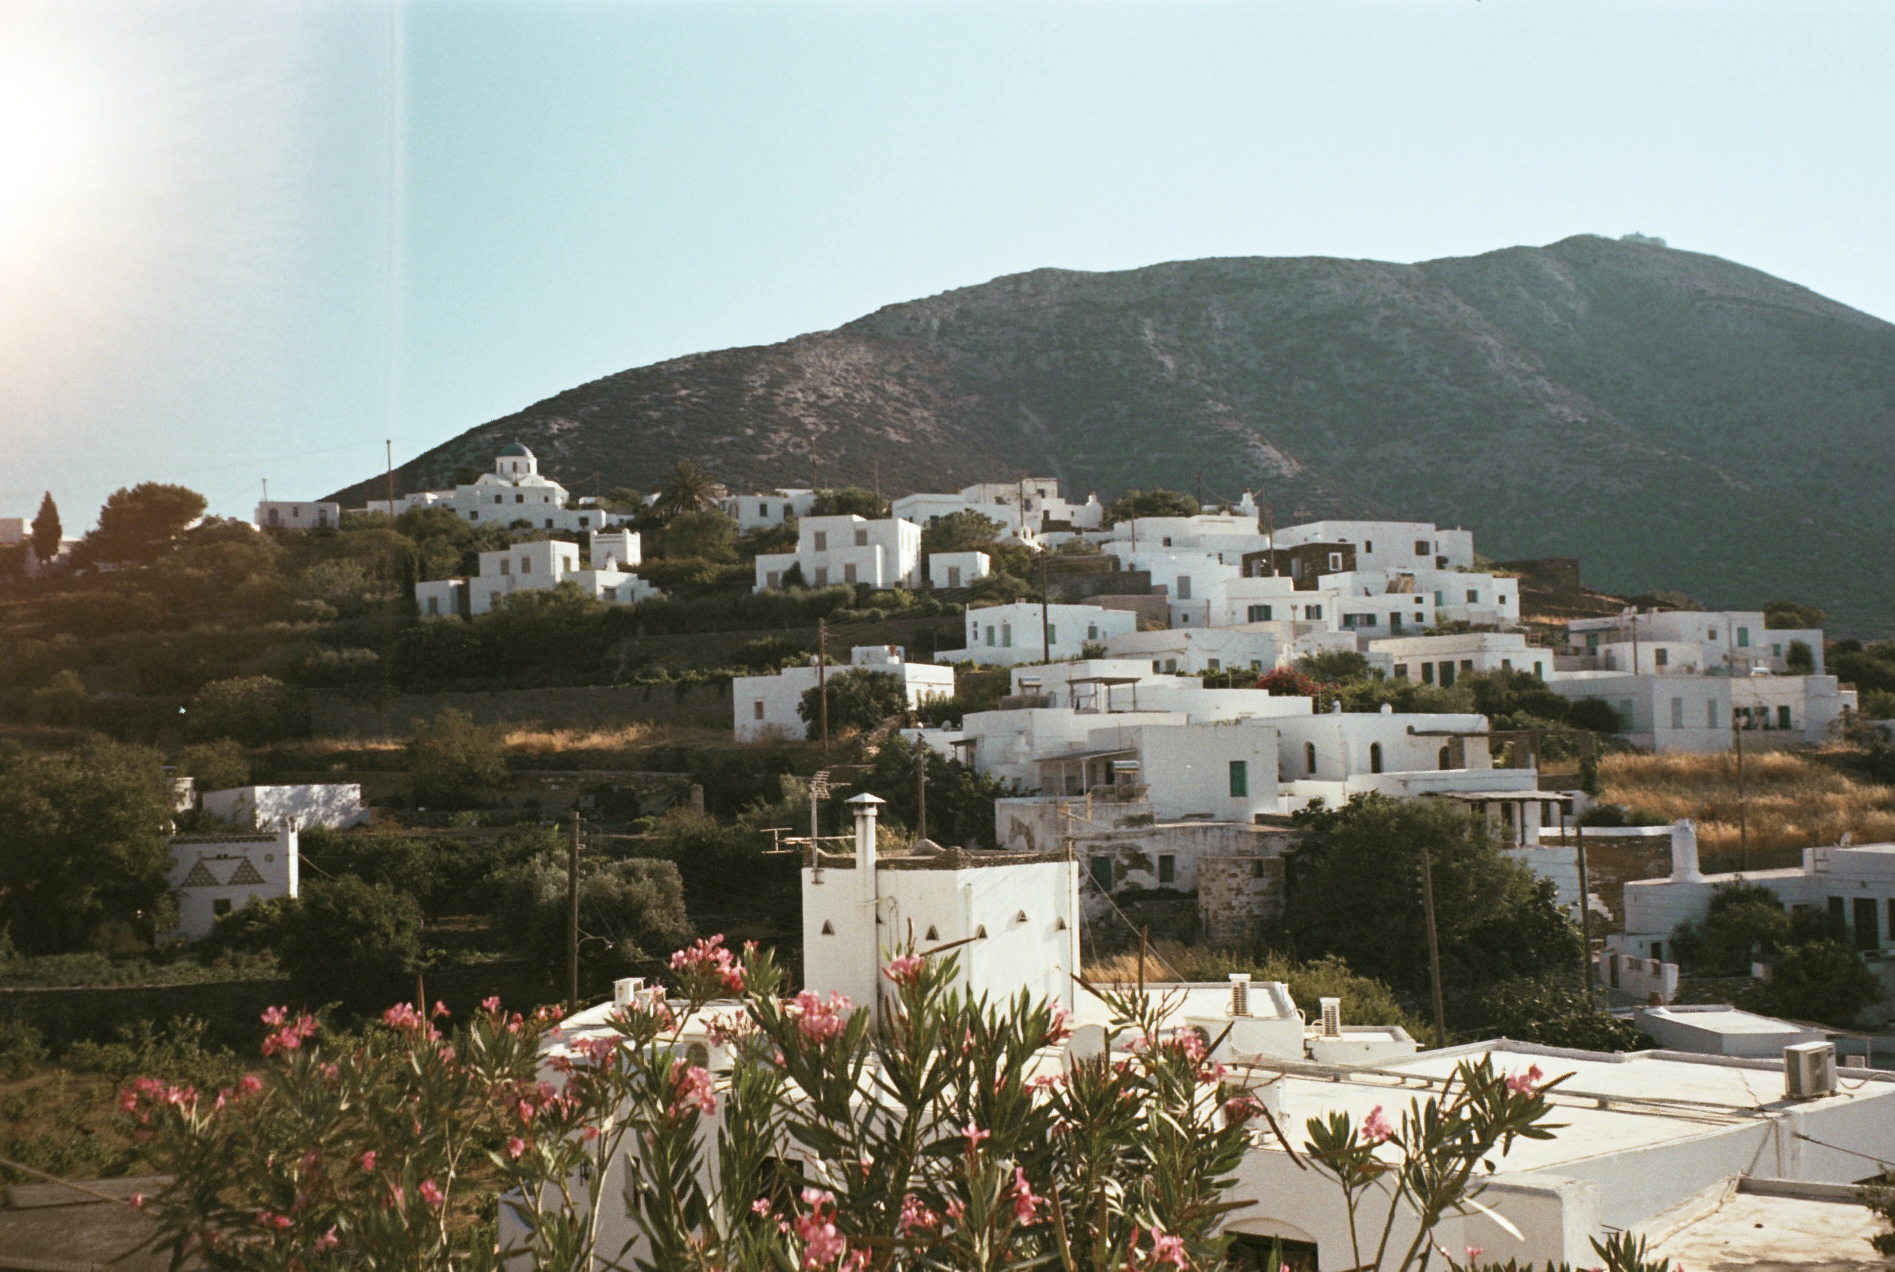 sifnos greece 05.jpg